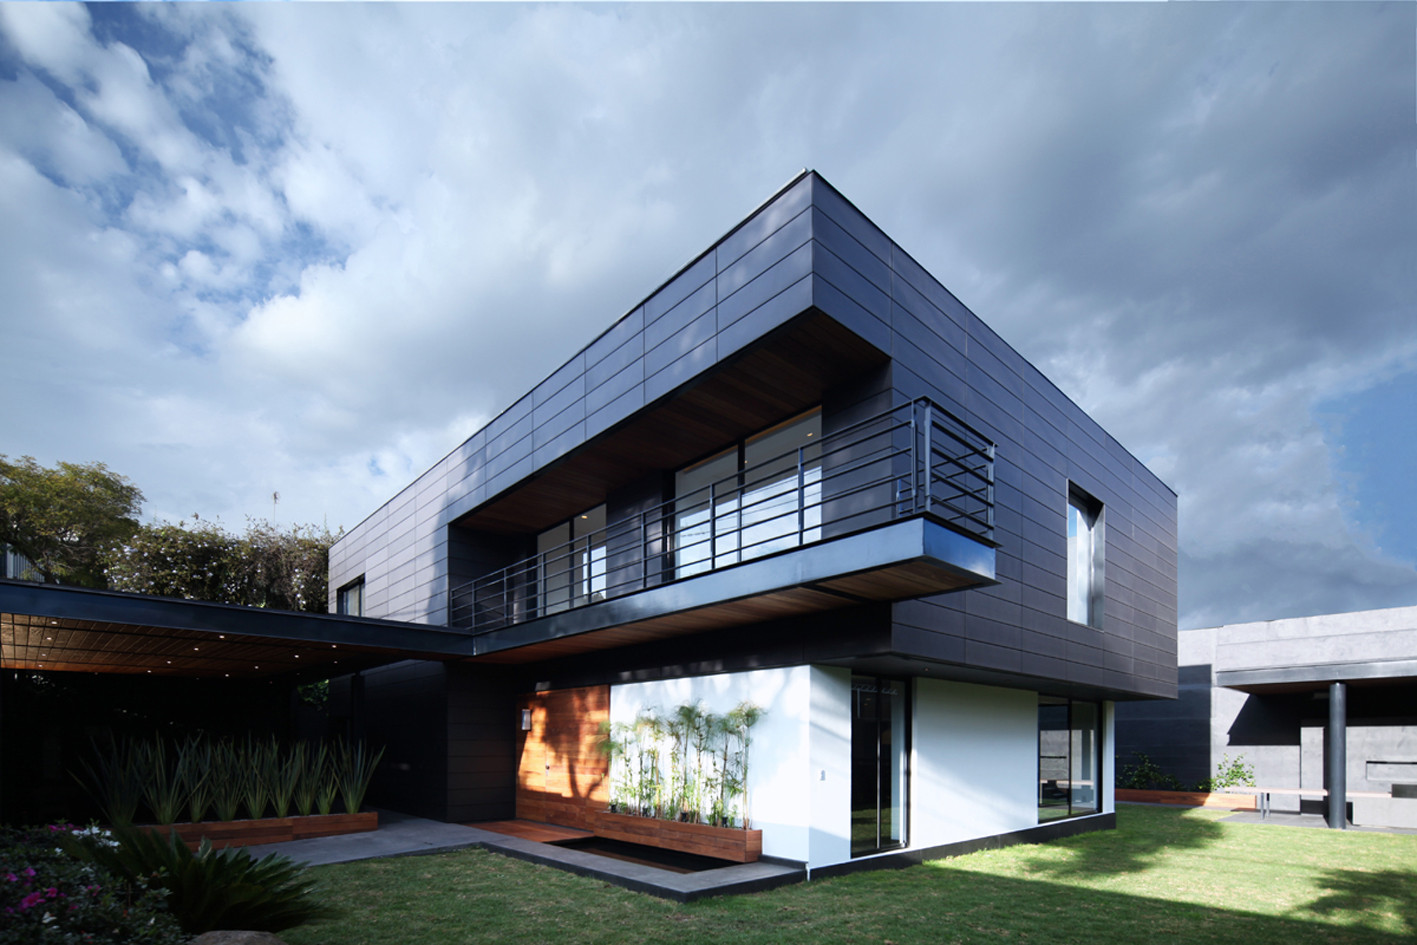 gallery of fatima house jorge hernández de la garza 5